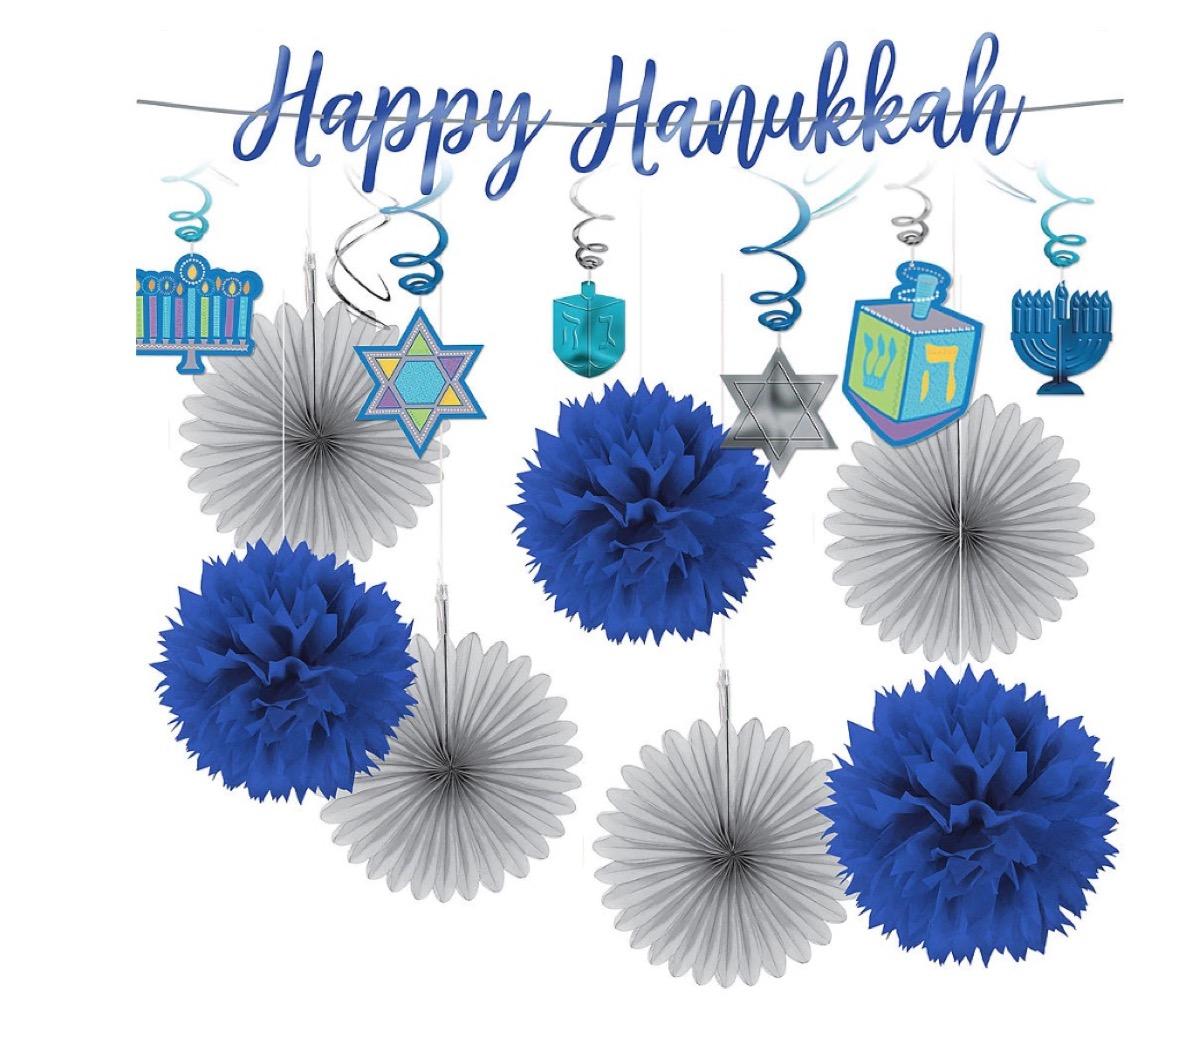 blue and white paper hanukkah garland, hanukkah decorations